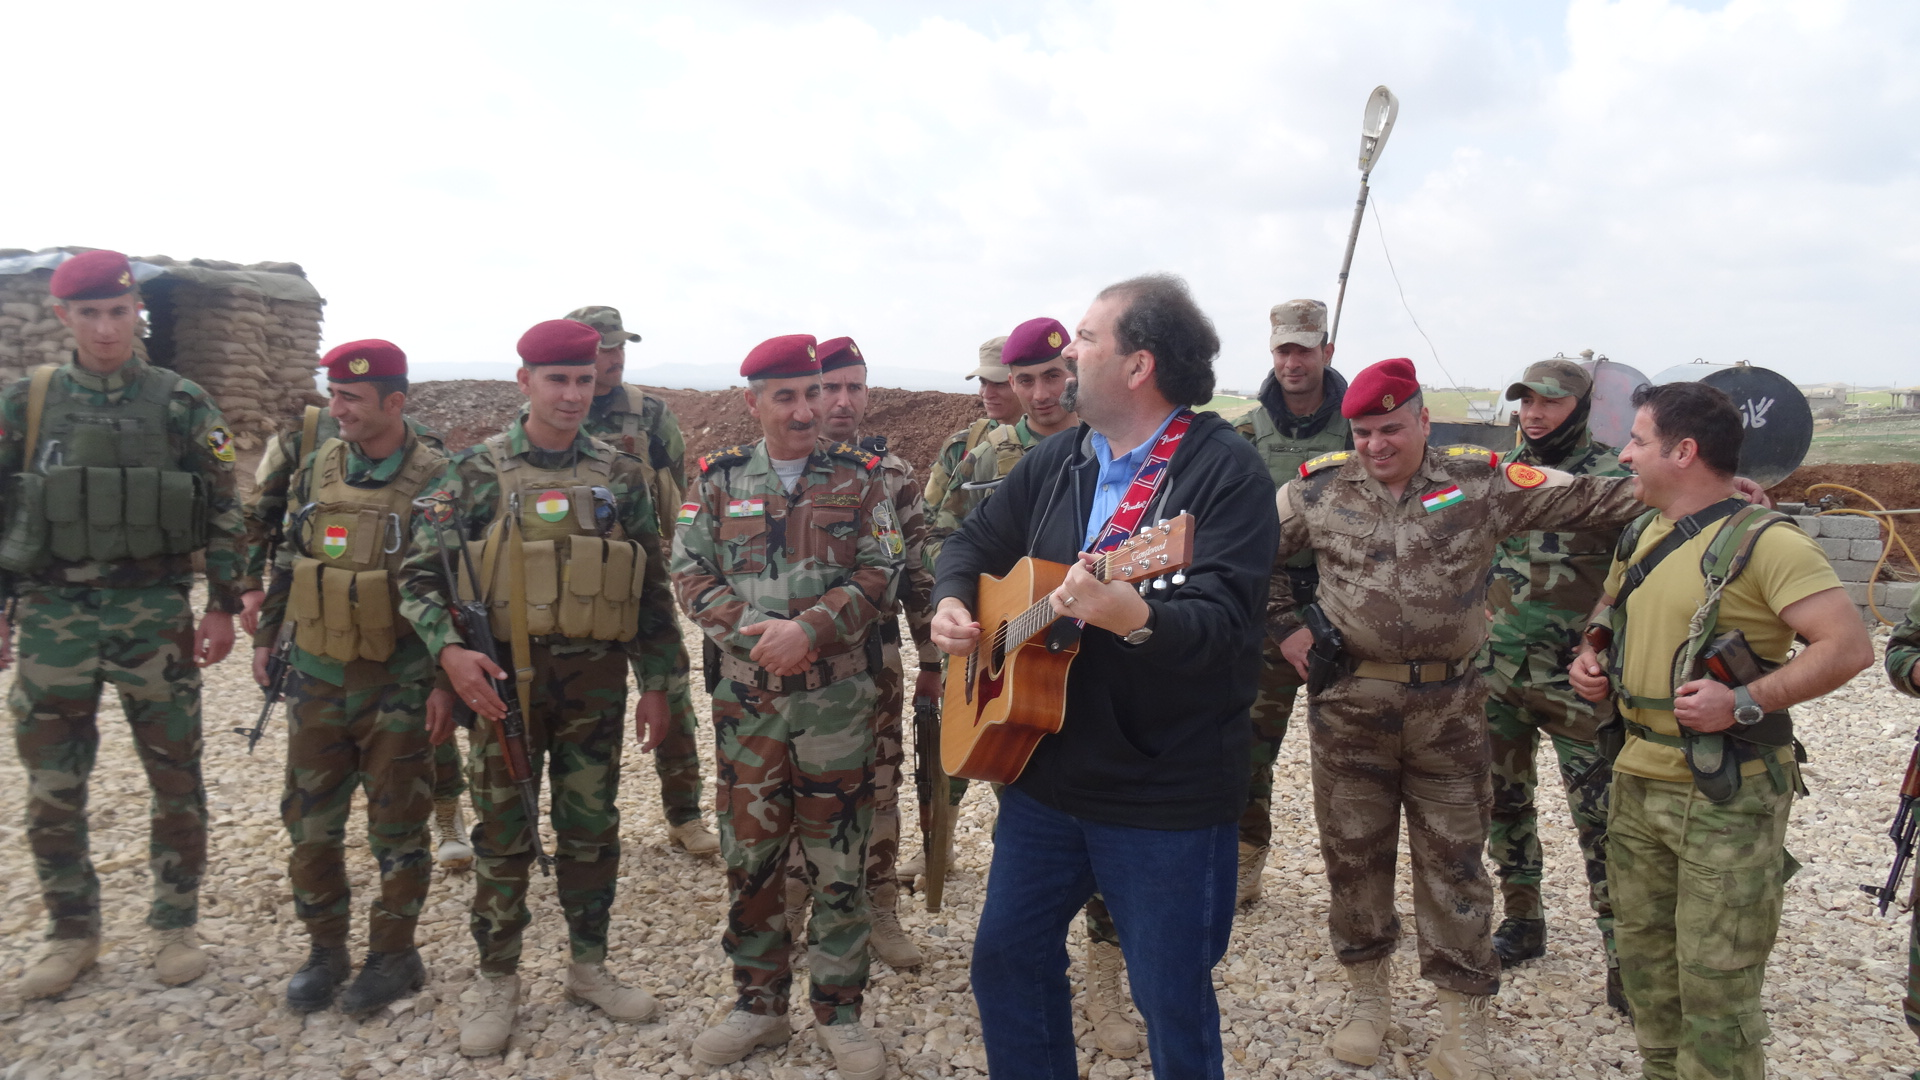 Randy entertains some members of the Pashmerga (Kurdish) army at the border